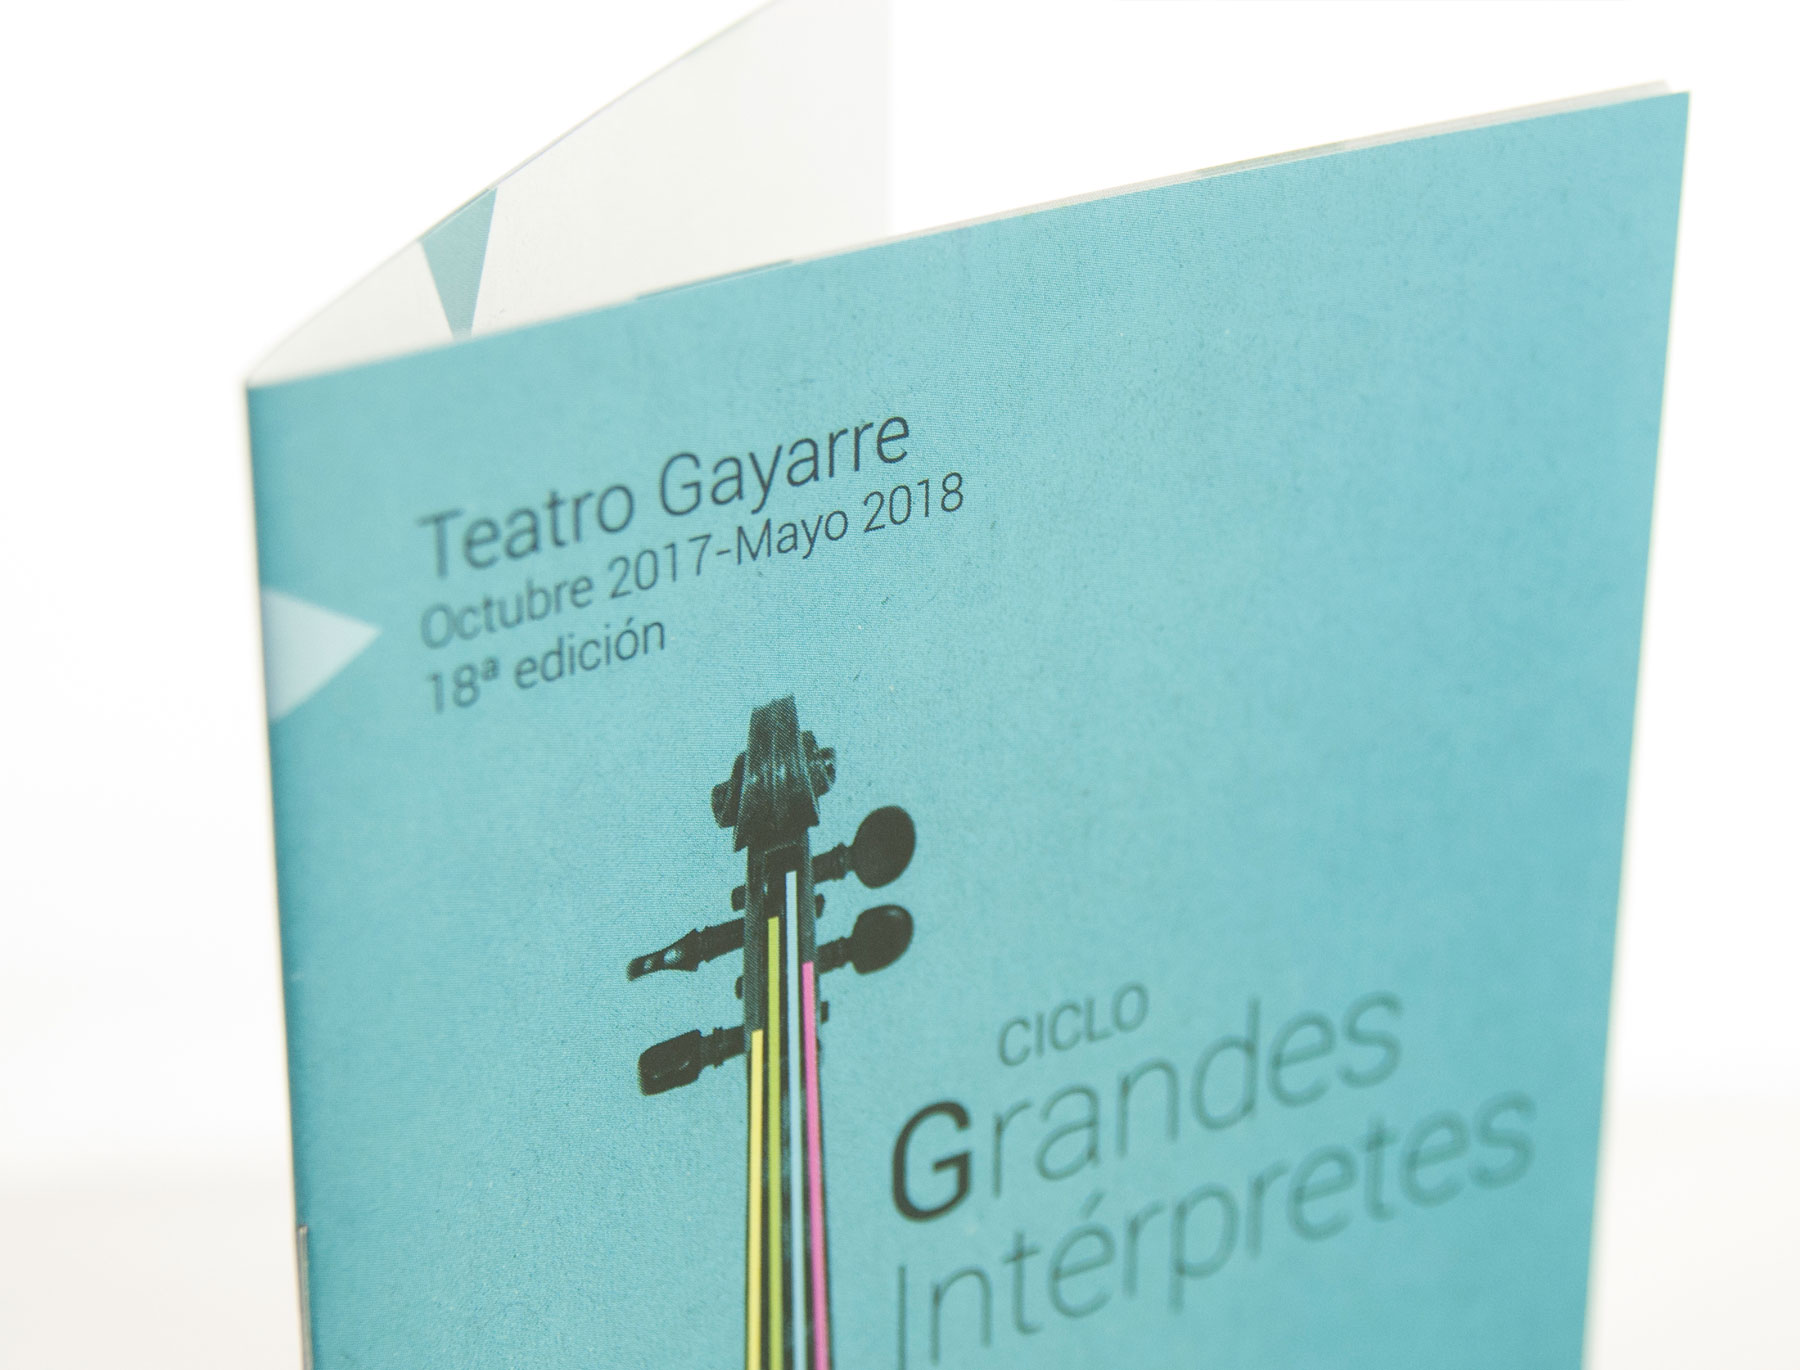 Teatro Gayarre de Pamplona